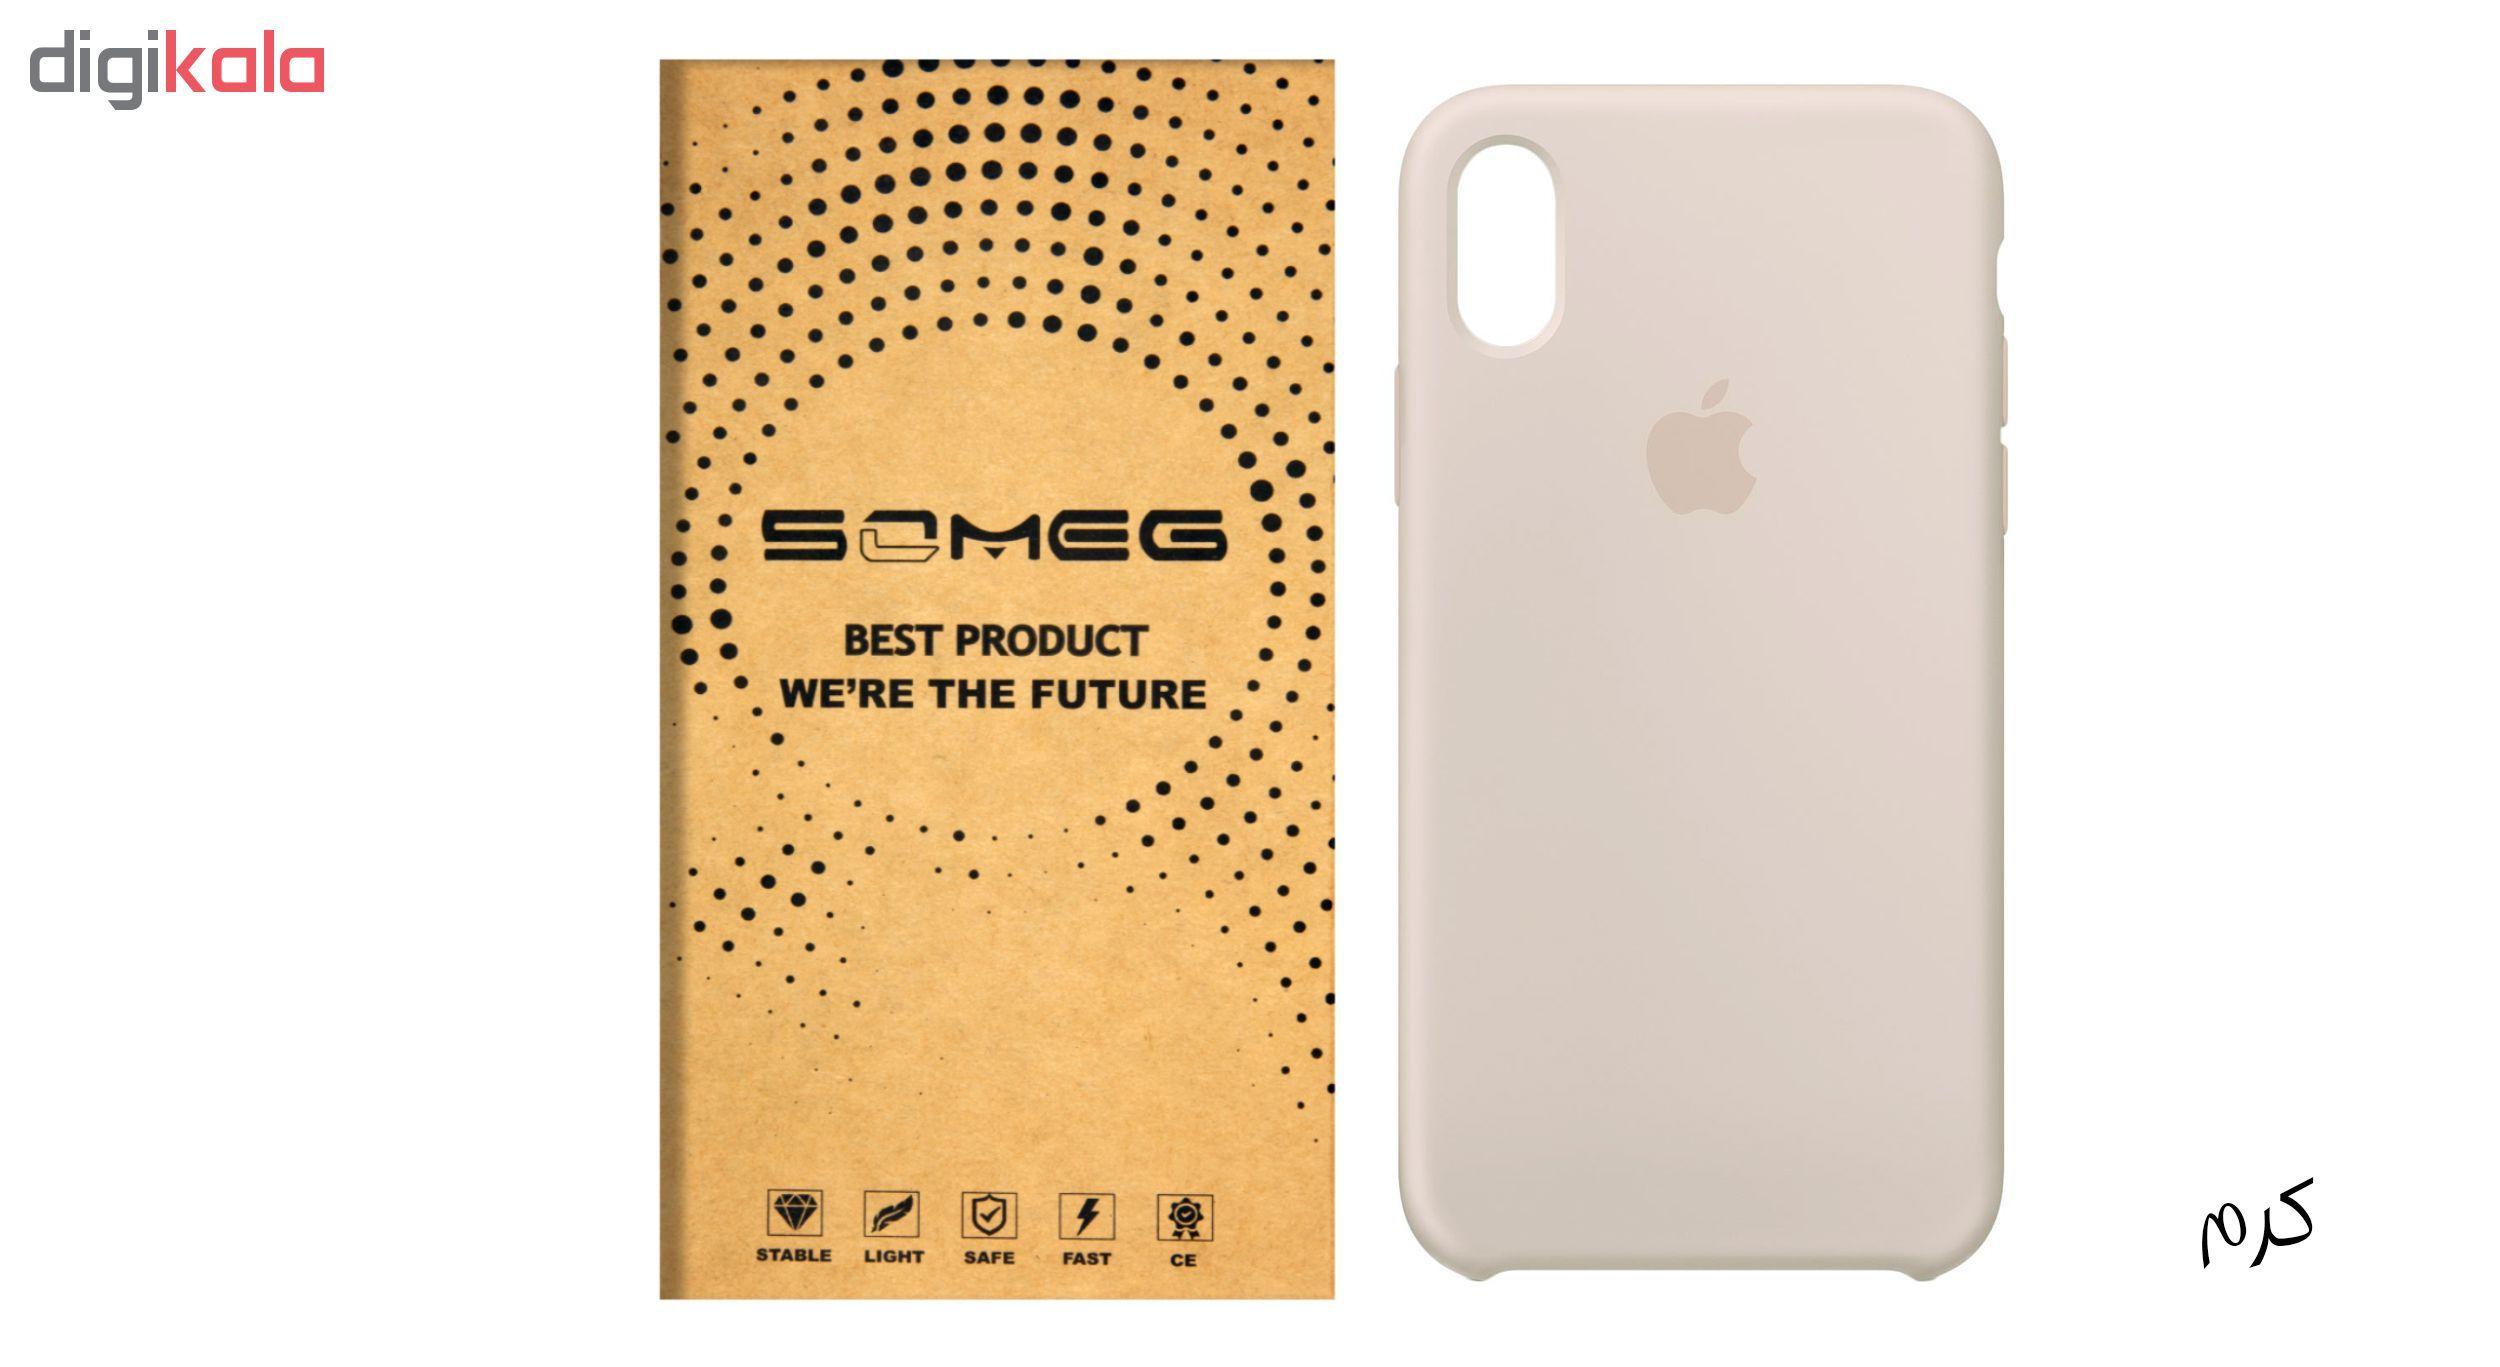 کاور سومگ مدل SIC مناسب برای گوشی موبایل اپل iPhone X  main 1 32